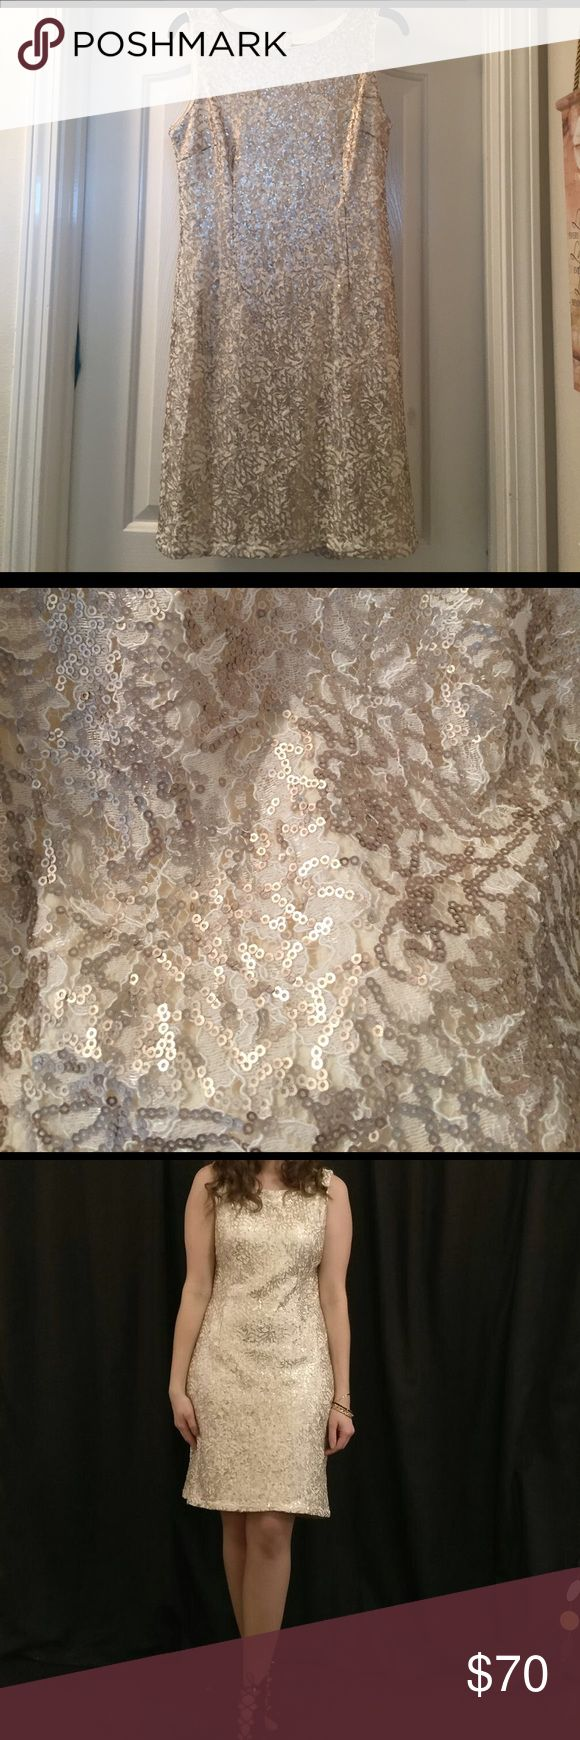 Gold sequin dress Gold/beige sequin dress. Only worn once! Leslie Fay Dresses